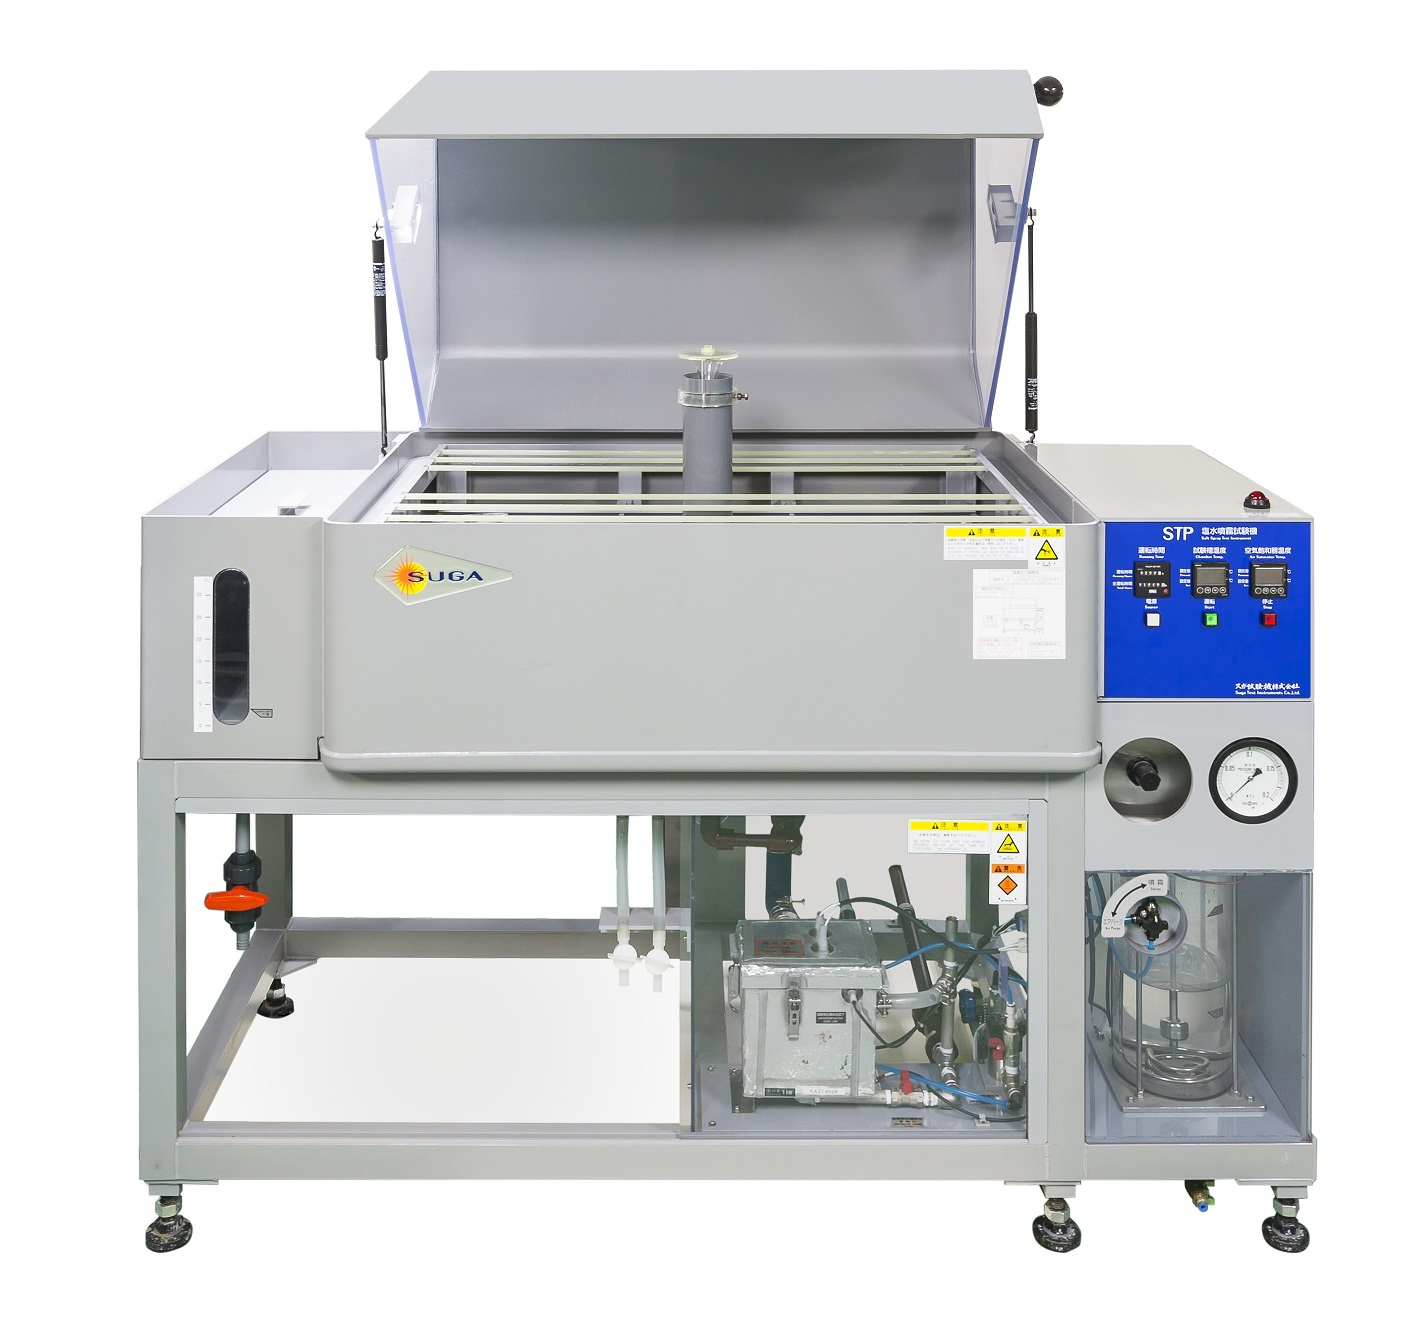 Catalogue cho máy phun sương muối stp-90v-5 sugatest